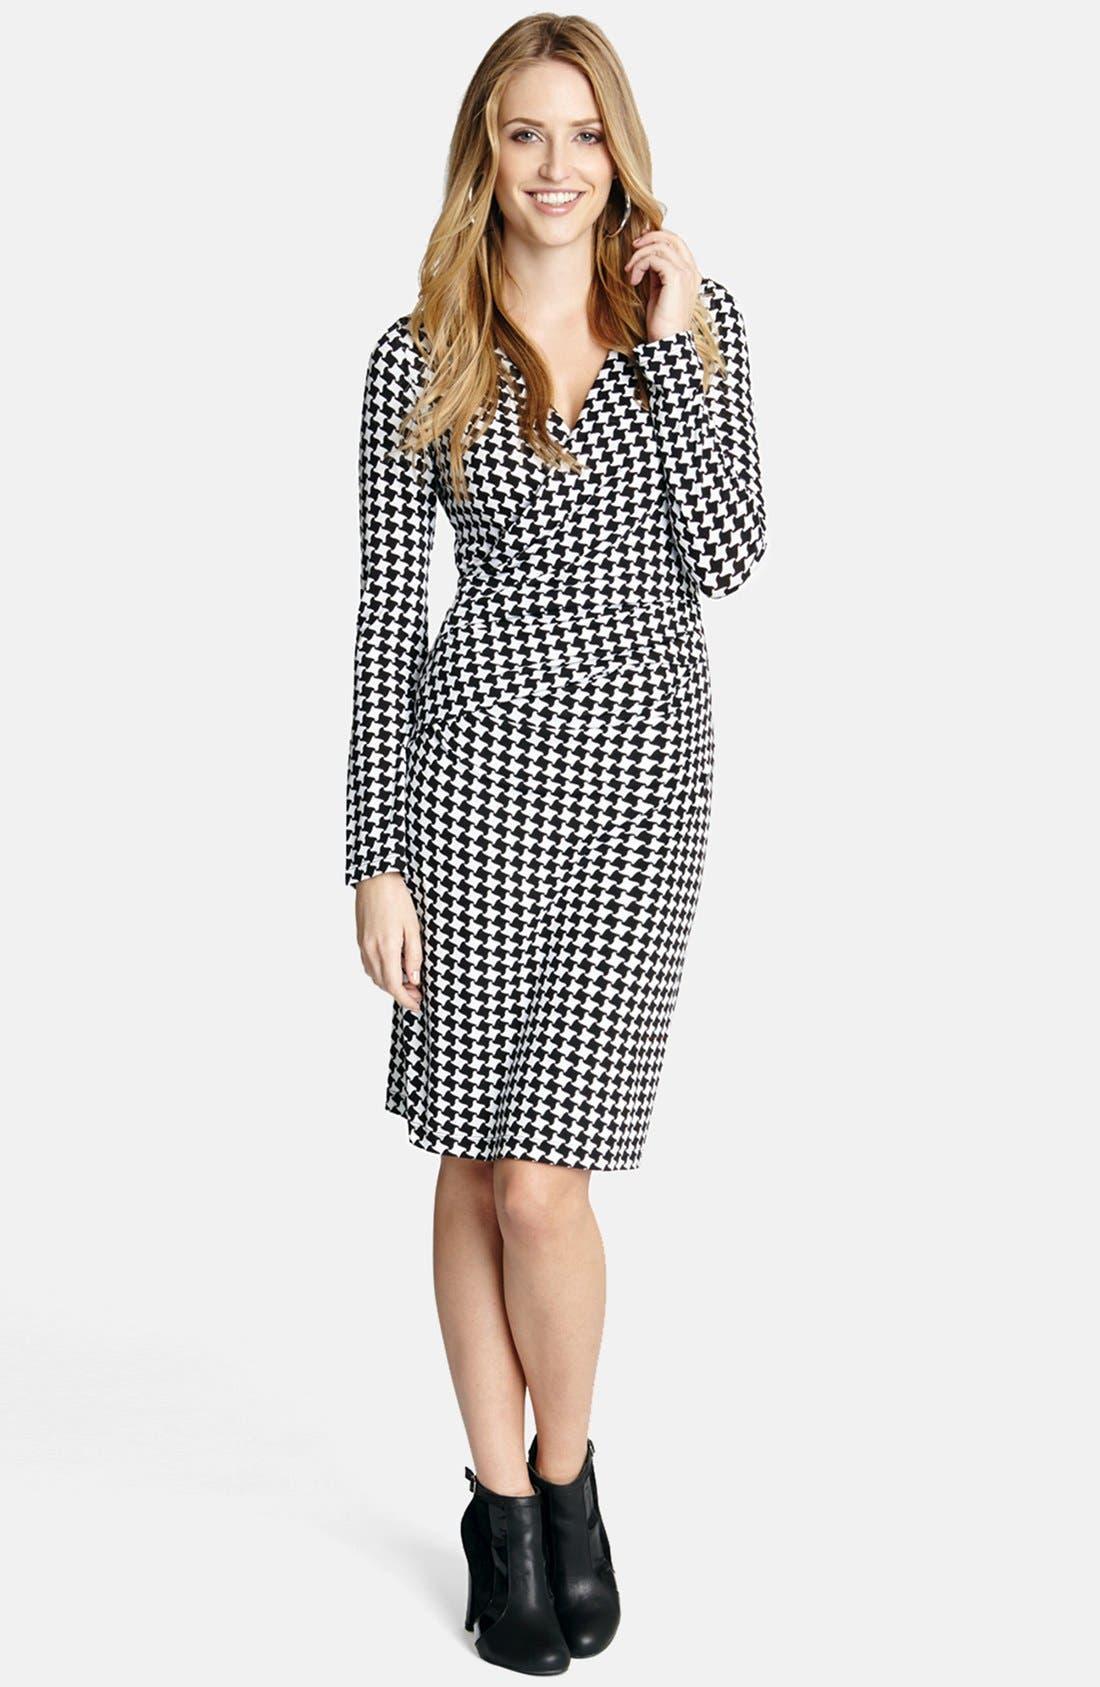 Alternate Image 1 Selected - Karen Kane 'Checkmate' Faux Wrap Dress